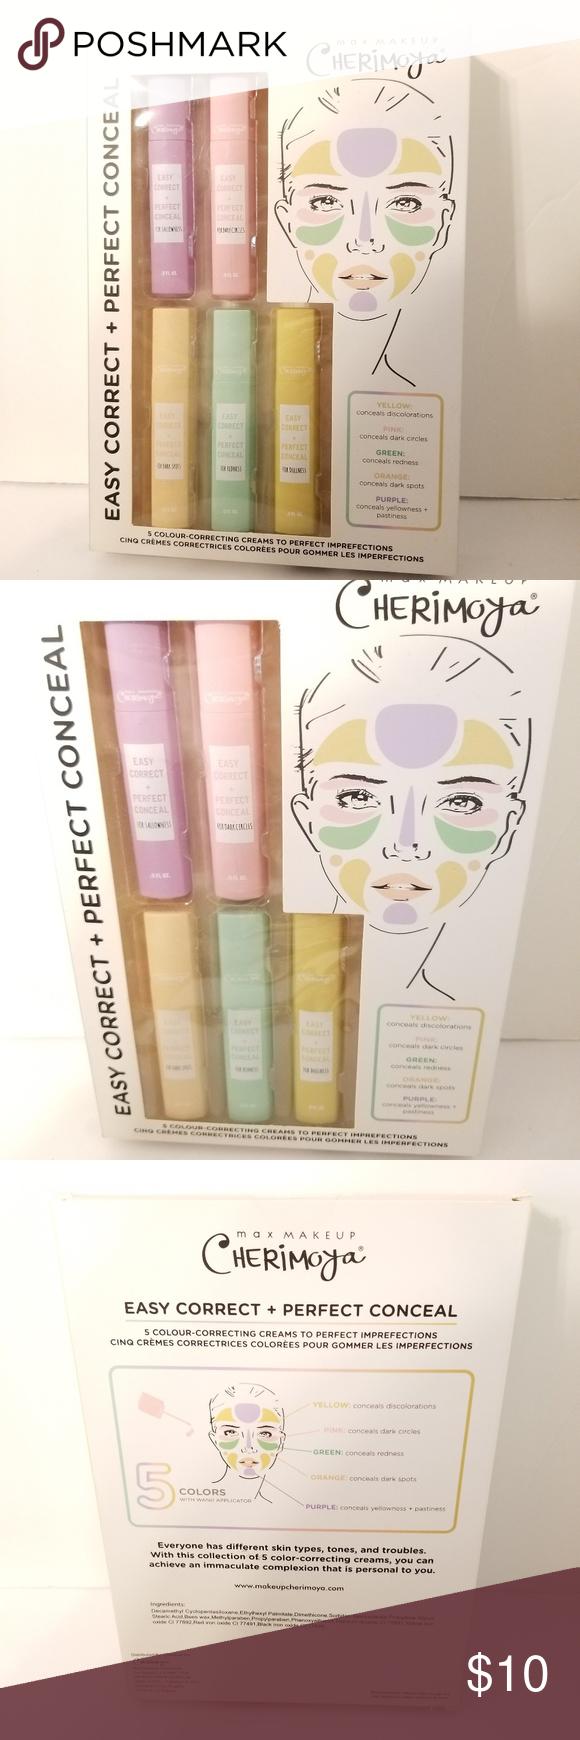 Max Makeup Cherimoya 5 Easy Correct + Conceal Max makeup